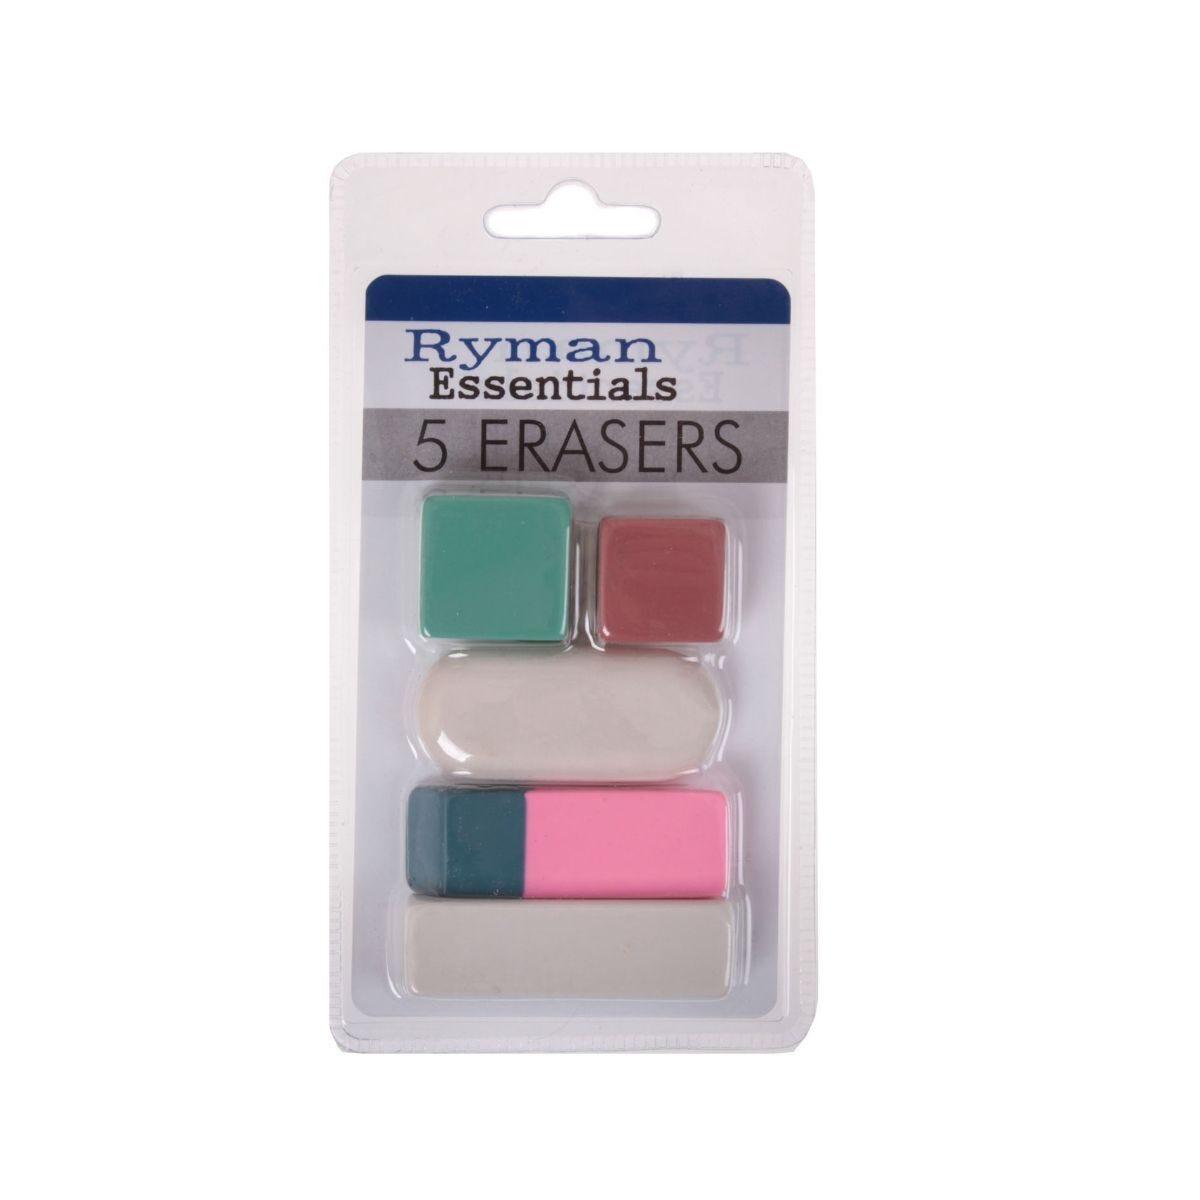 Ryman Eraser Pack of 5